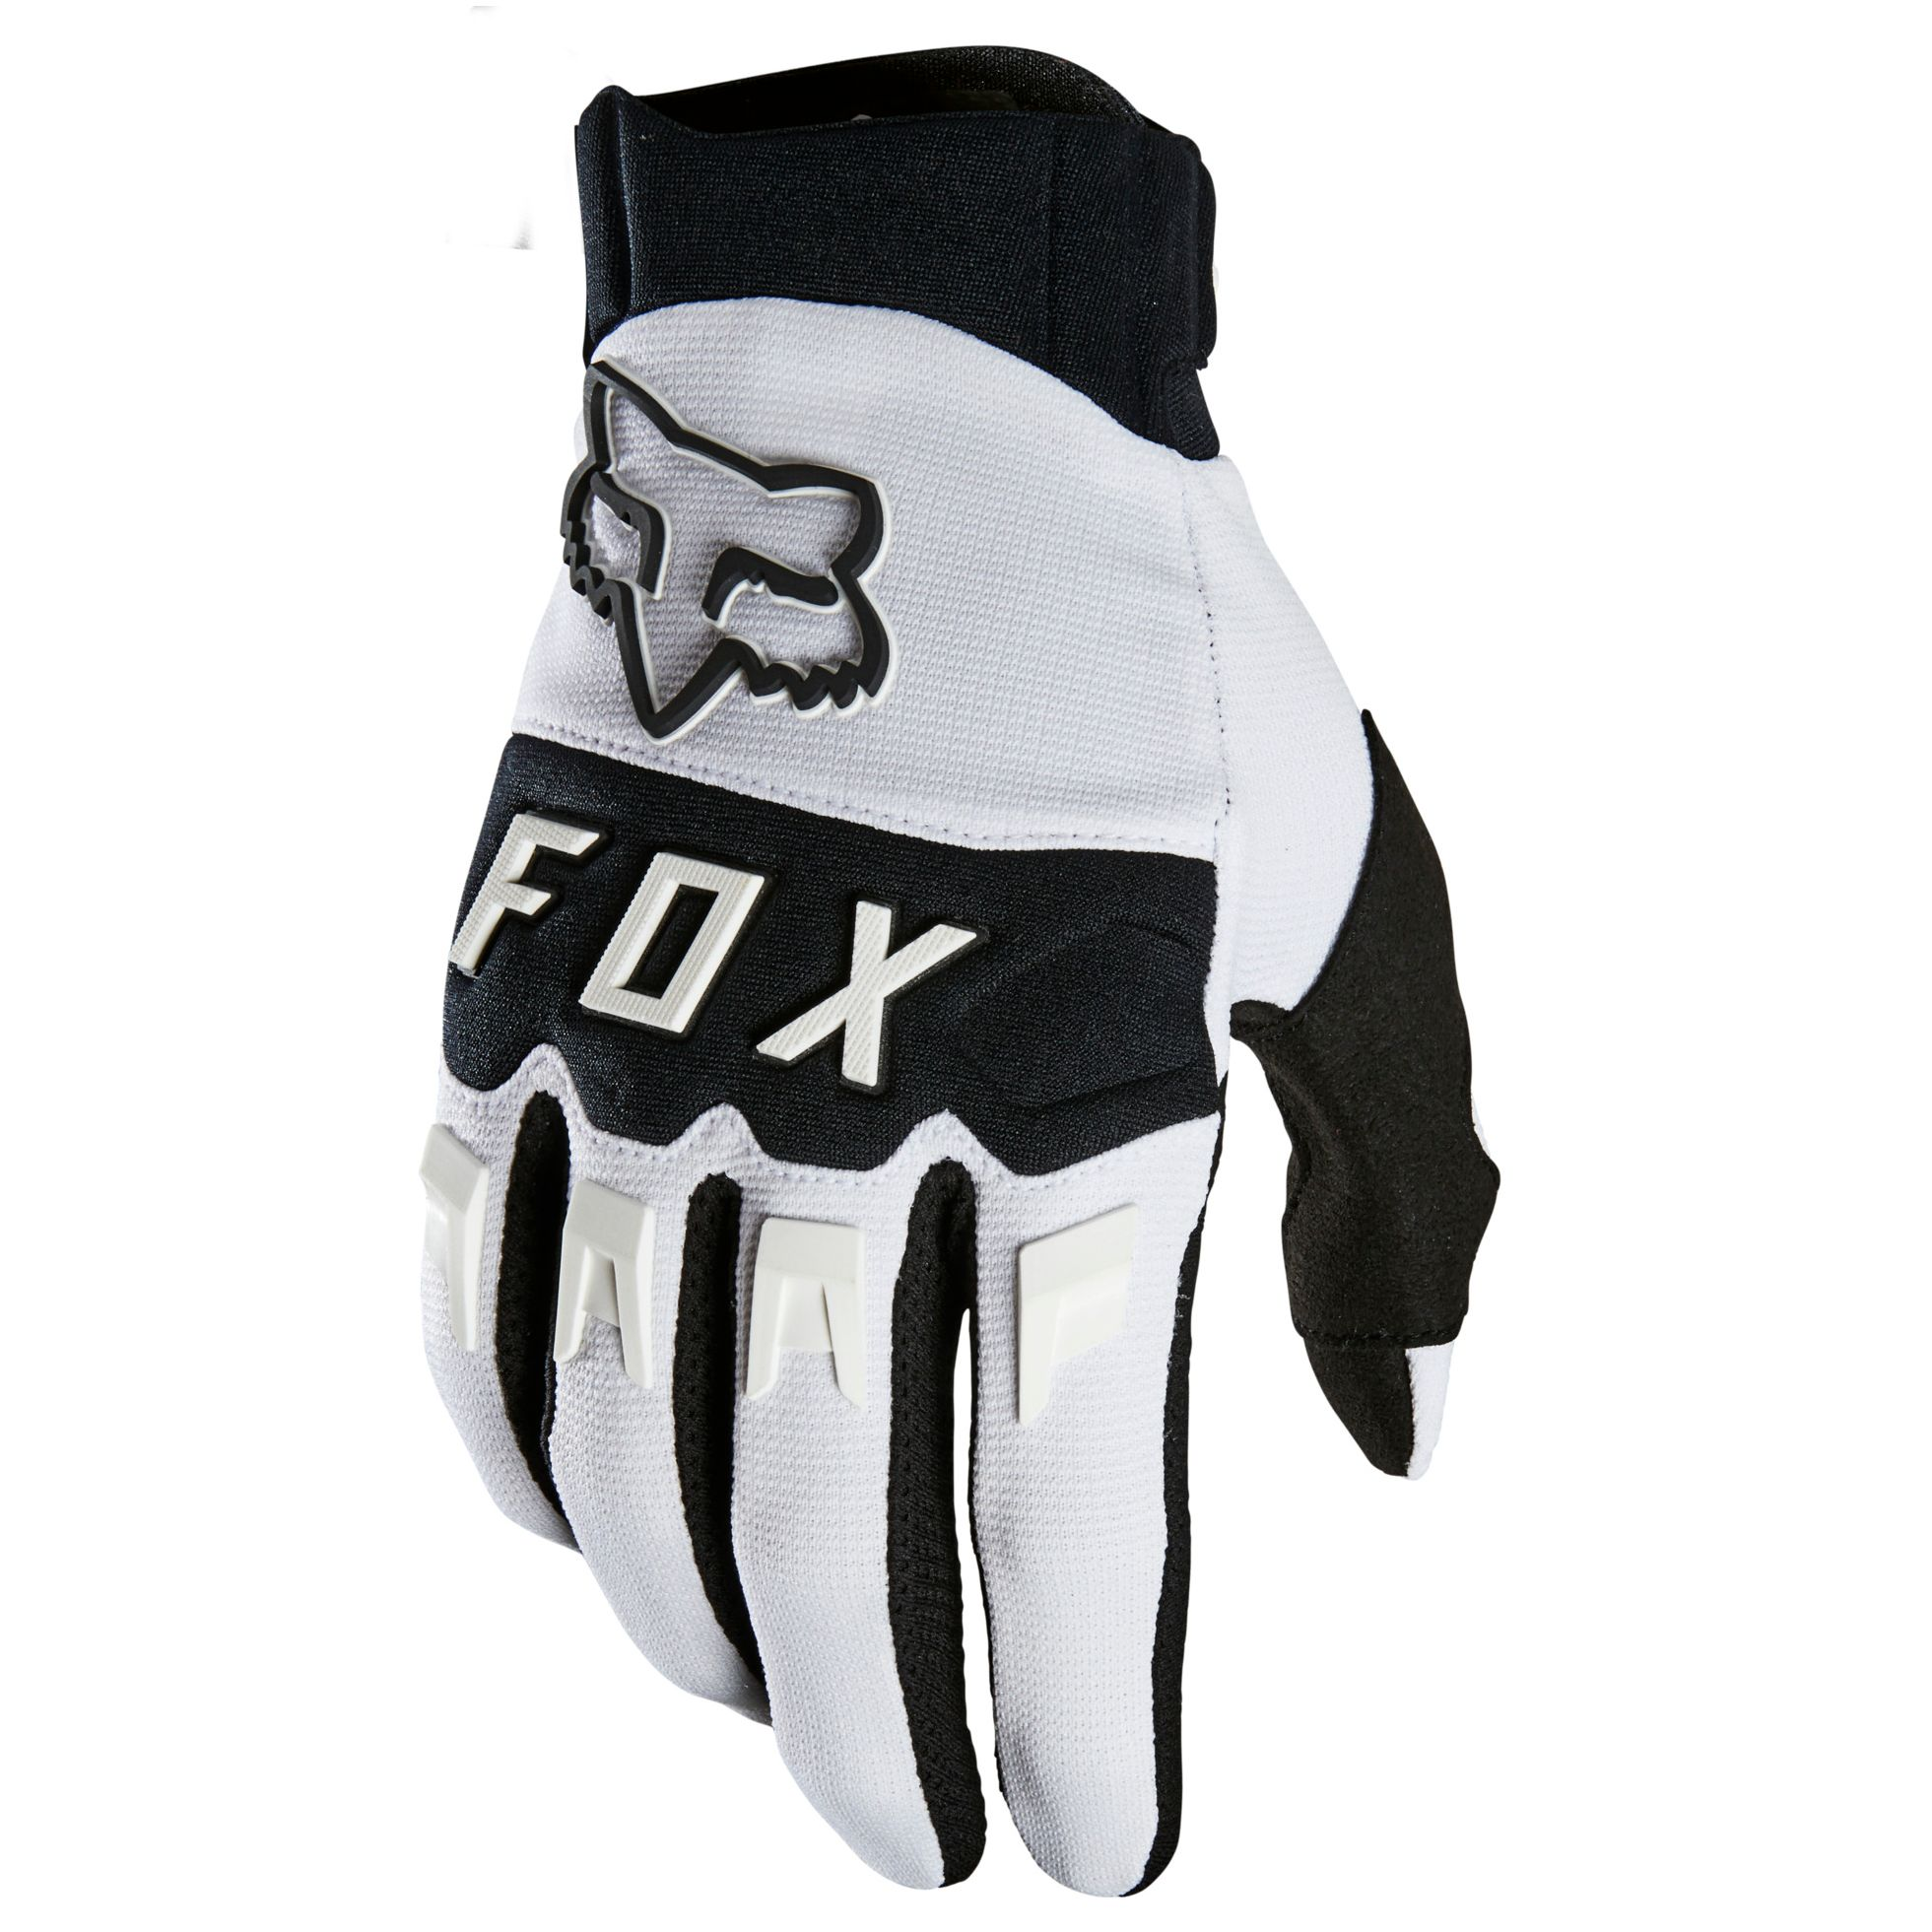 Gants cross Fox DIRTPAW - WHITE 2021